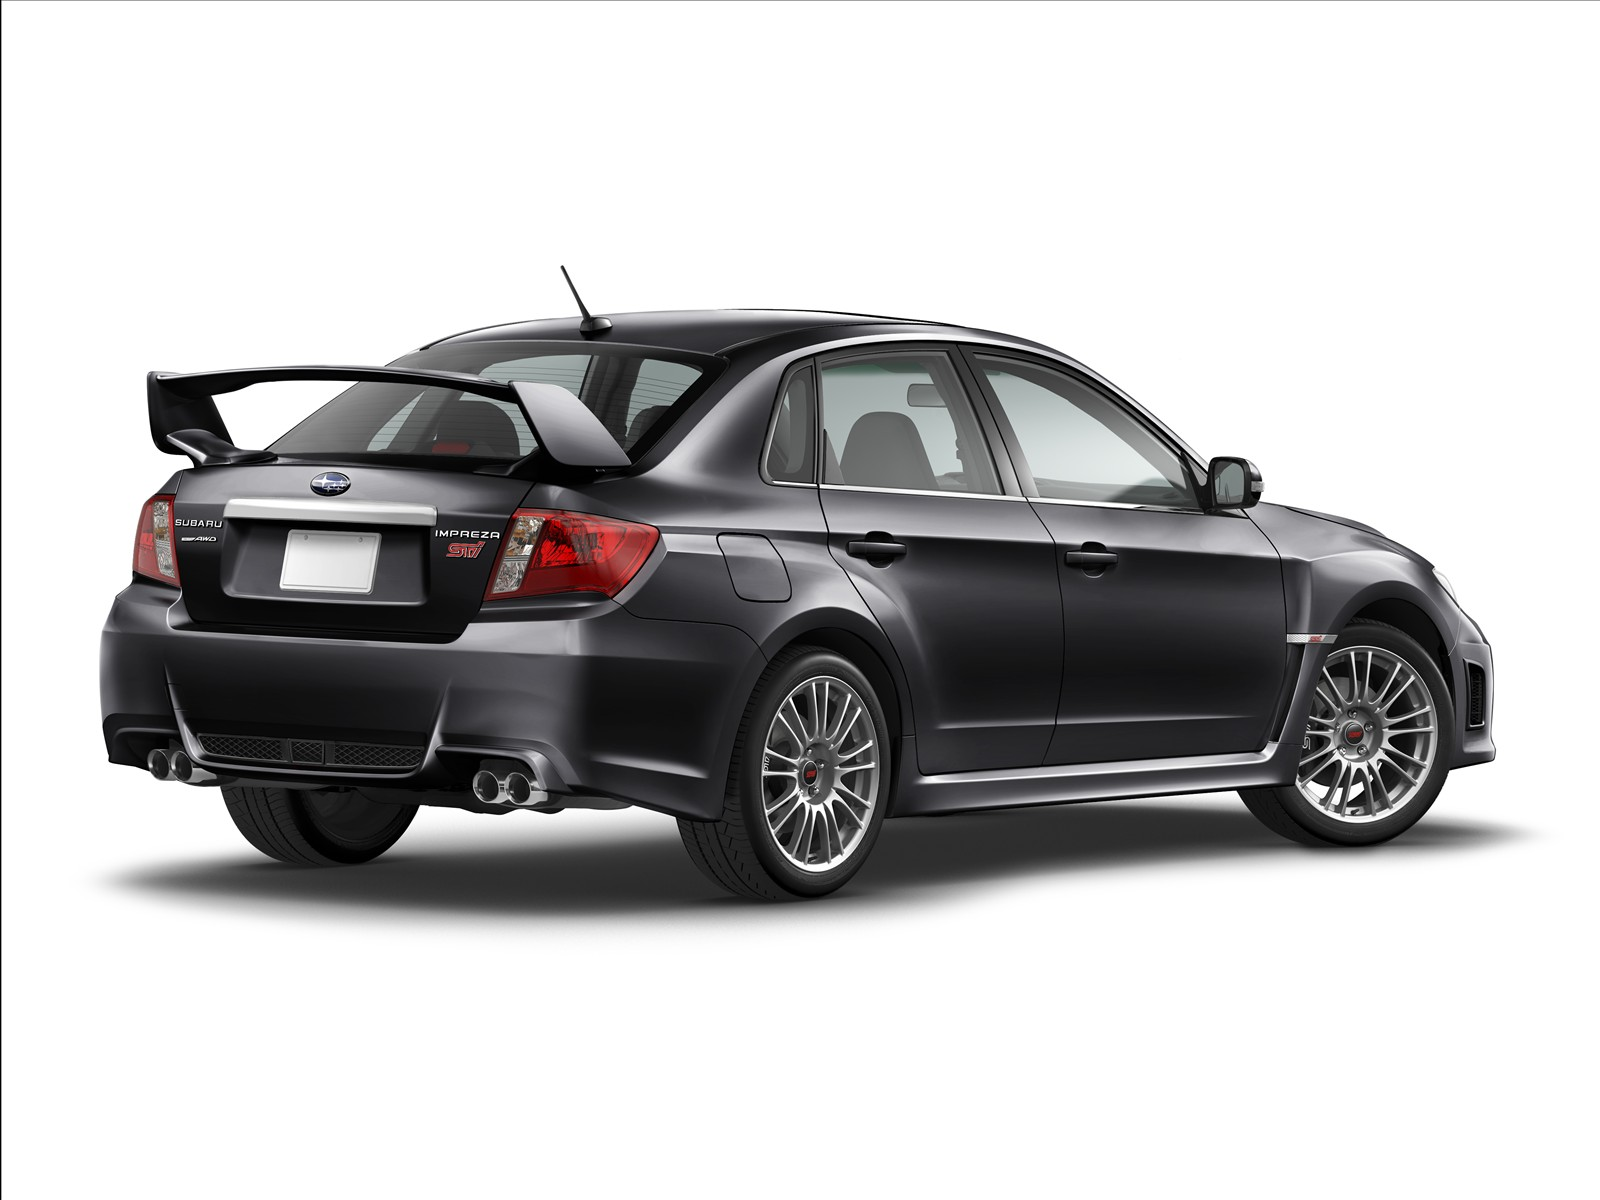 Subaru-impreza wrx sti